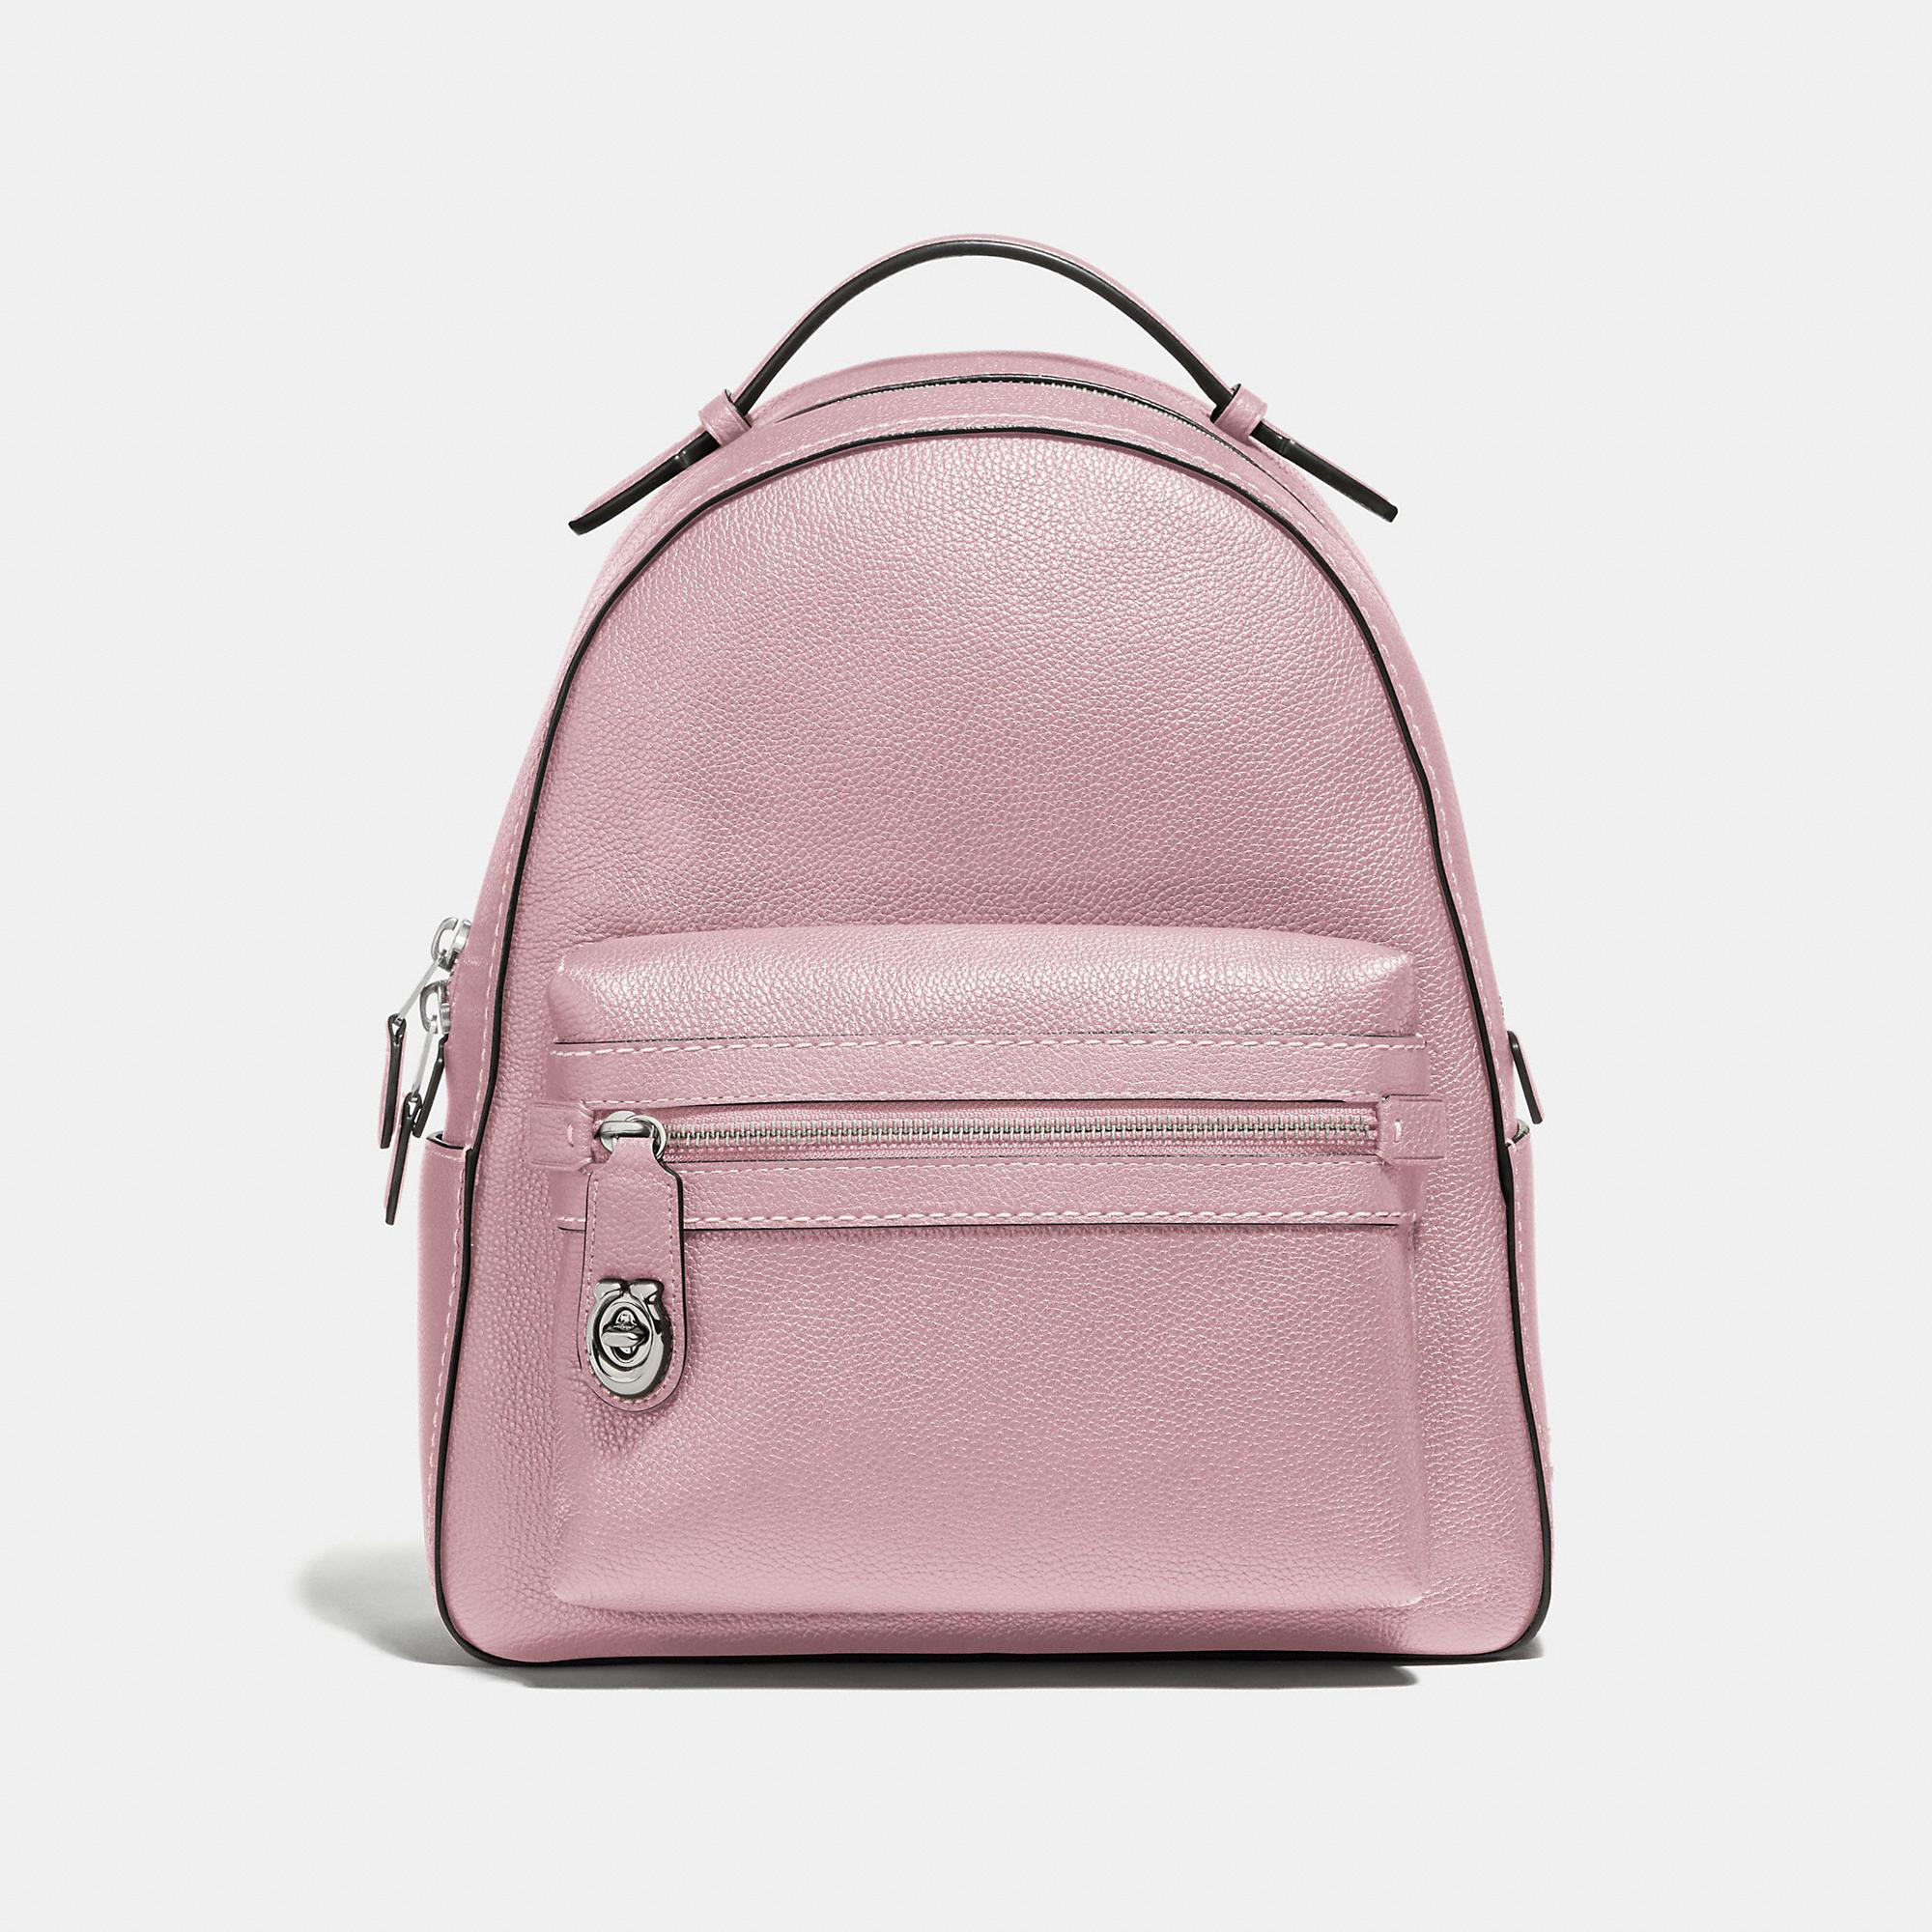 1ec1e3845 Coach Campus Backpack In Blossom/Silver | ModeSens